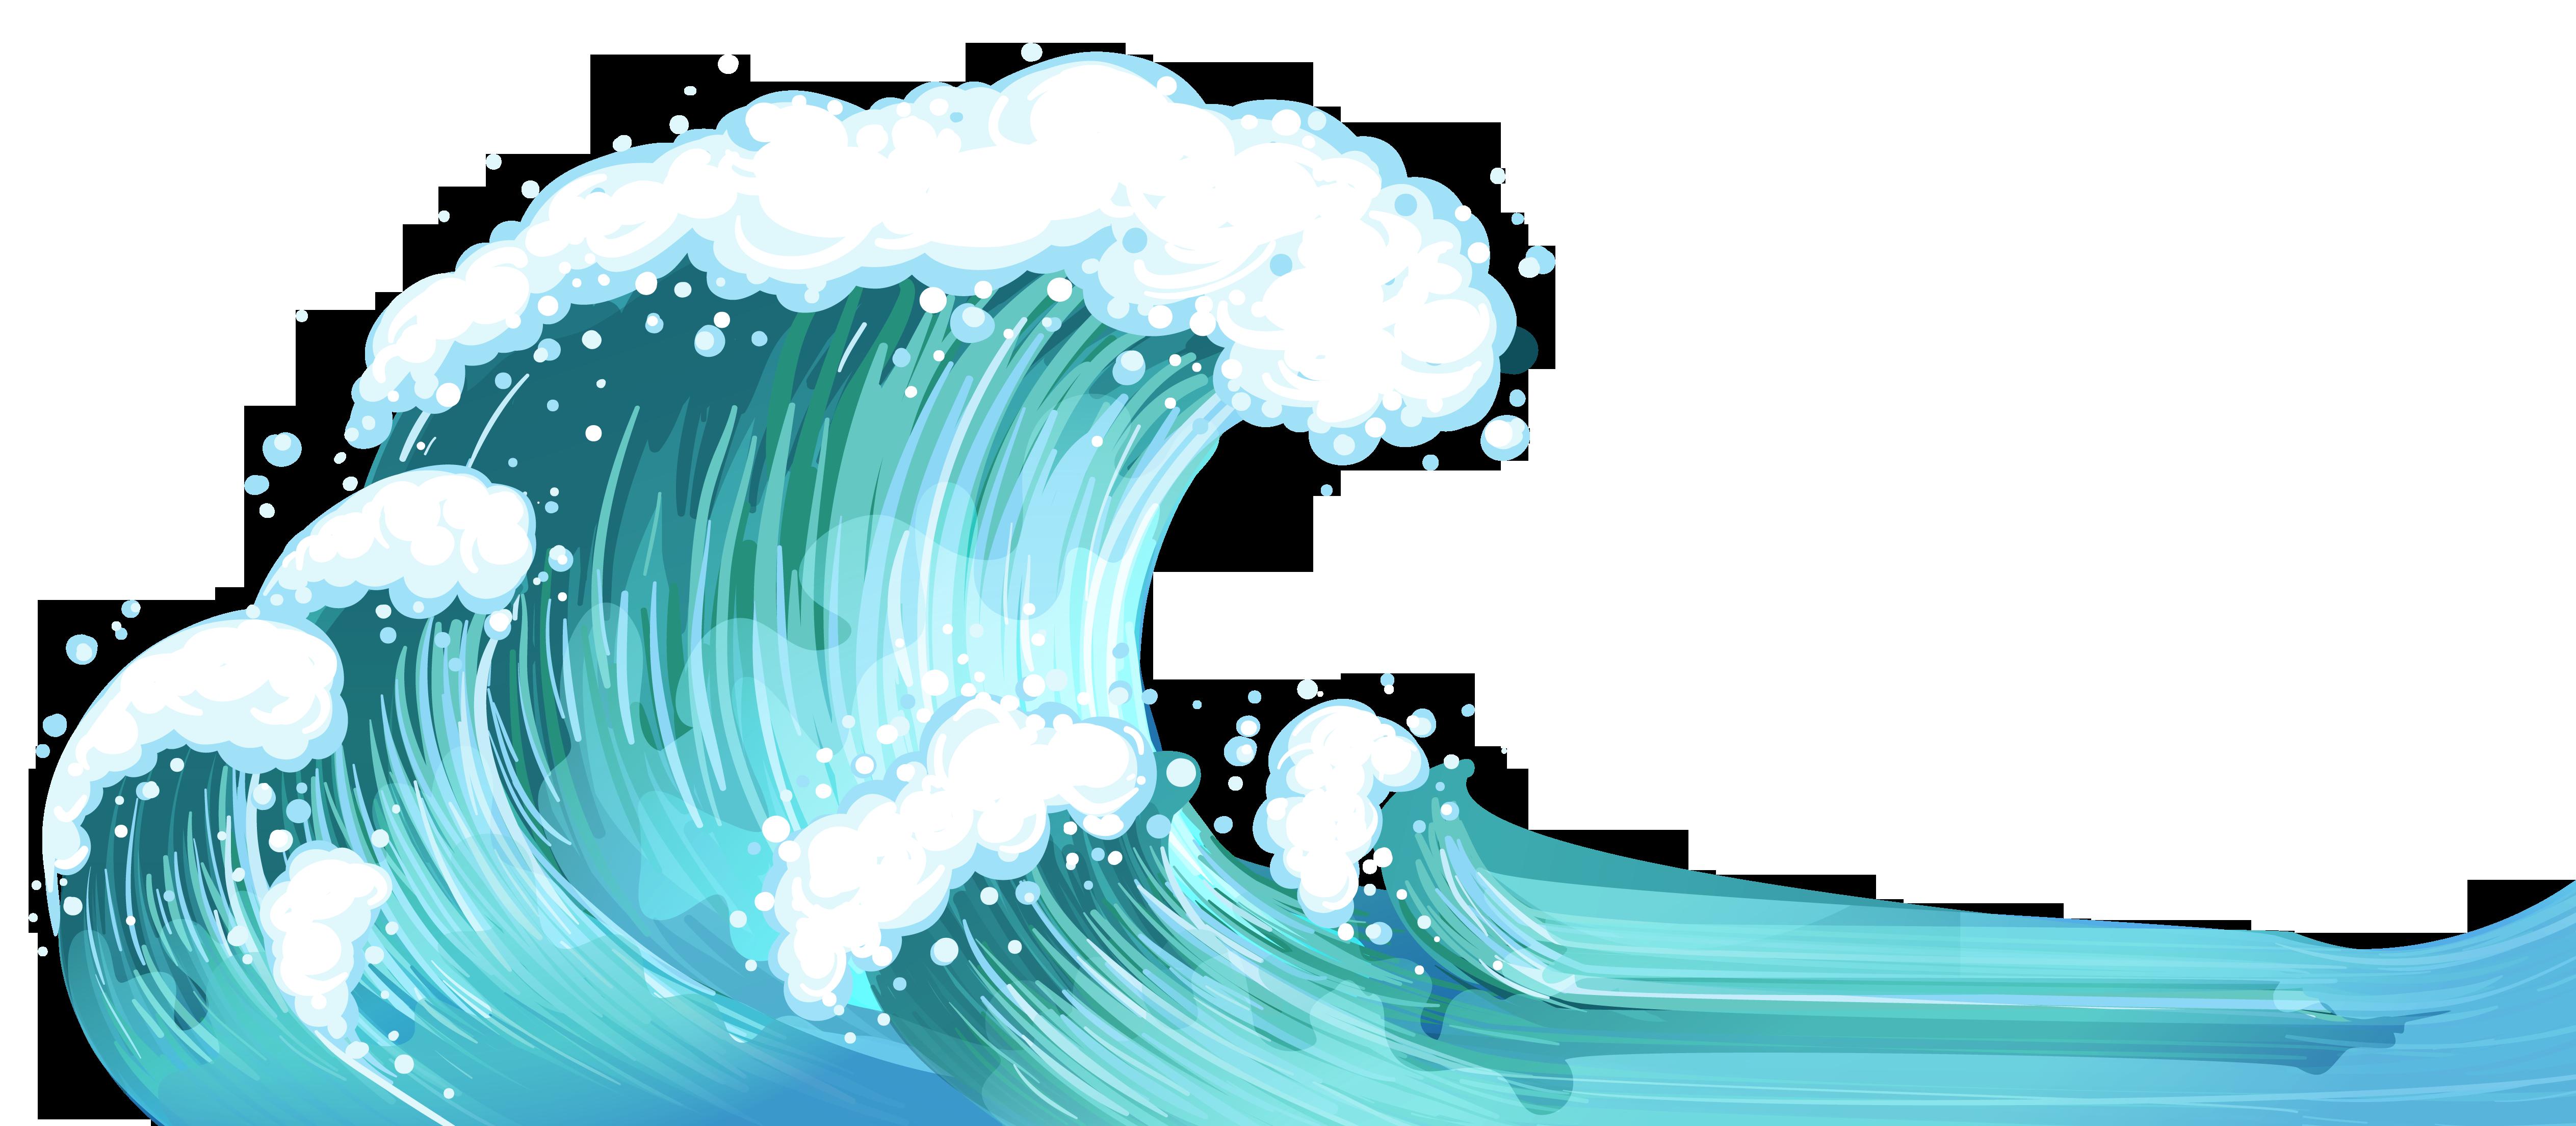 Ocean Waves Clip Art Simple Google Search Arte Da Animacao Moana Festa Infantil Arte Com Bailarina